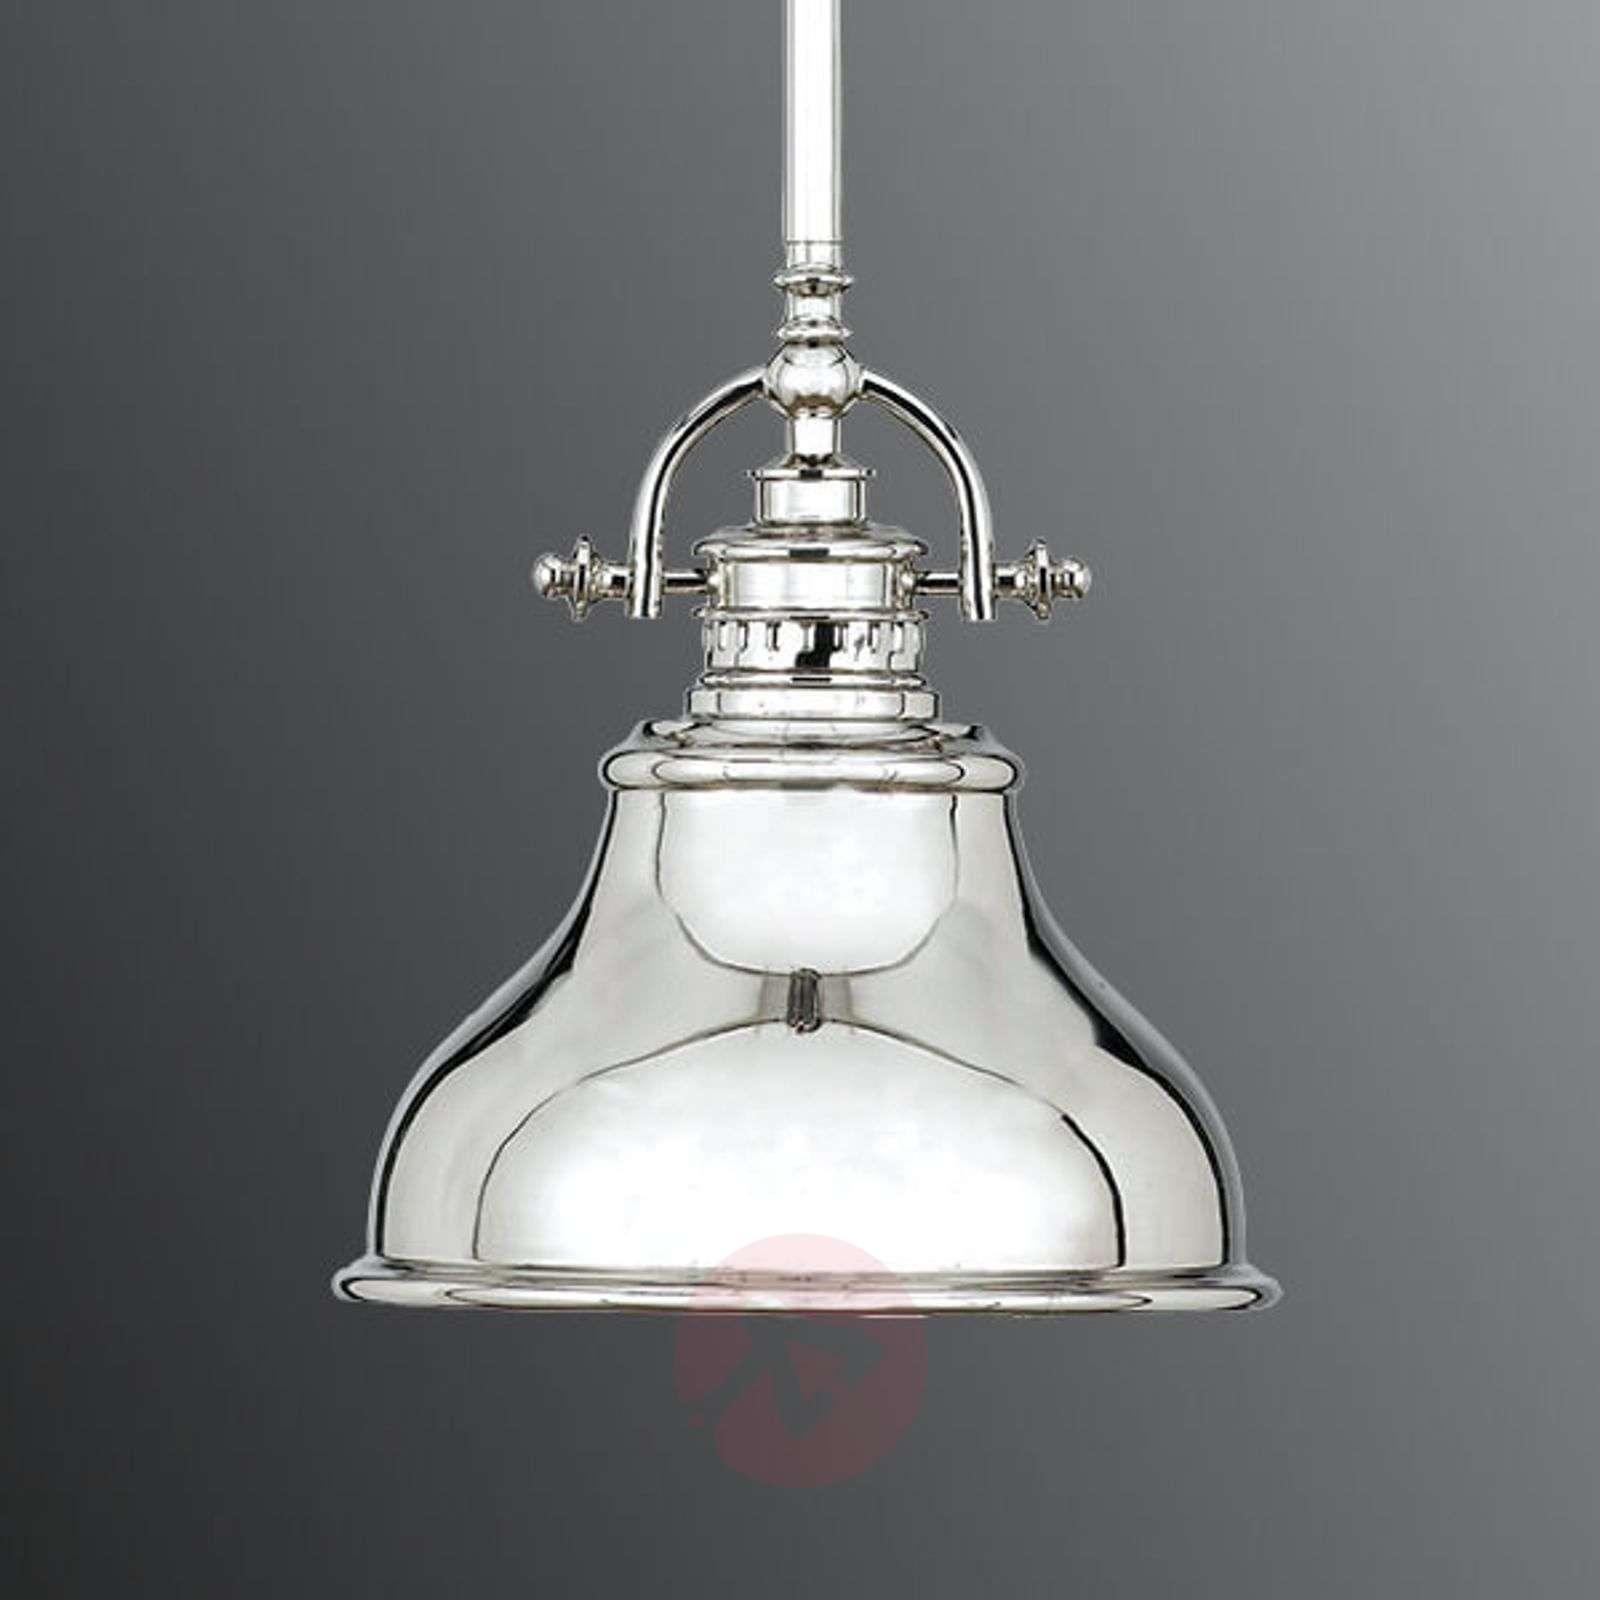 Emery pendant lamp 1-bulb silver 20.3 cm-3048609-01